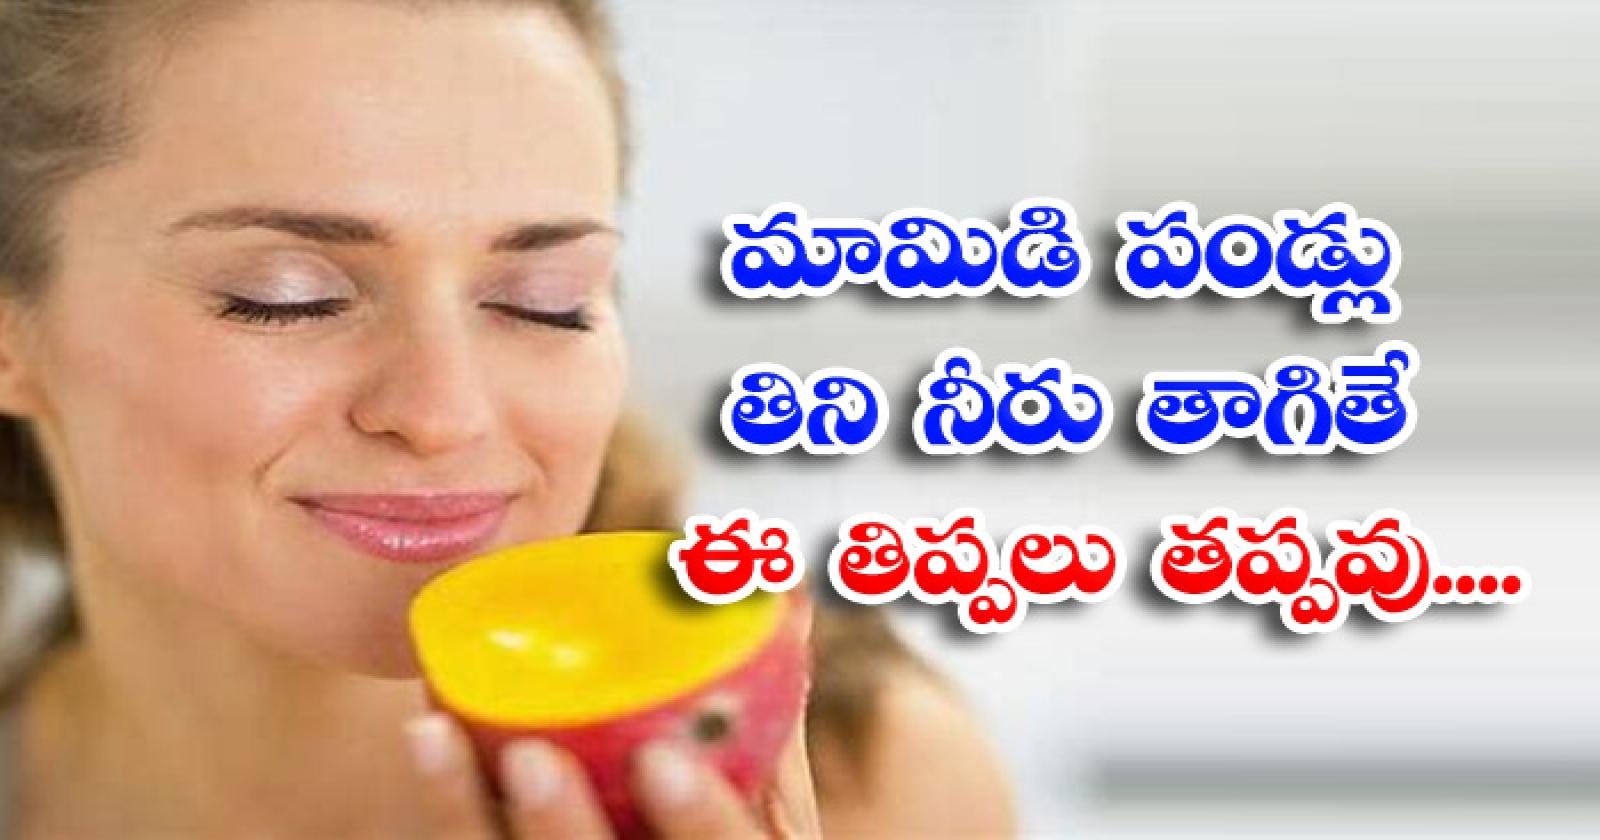 Drinking Water Eating Mango Mangoes Benefits Of Mangoes-మామిడి పండ్లు తిని నీరు తాగితే ఈ తిప్పలు తప్పవు..జాగ్రత్త-Latest News - Telugu-Telugu Tollywood Photo Image-TeluguStop.com